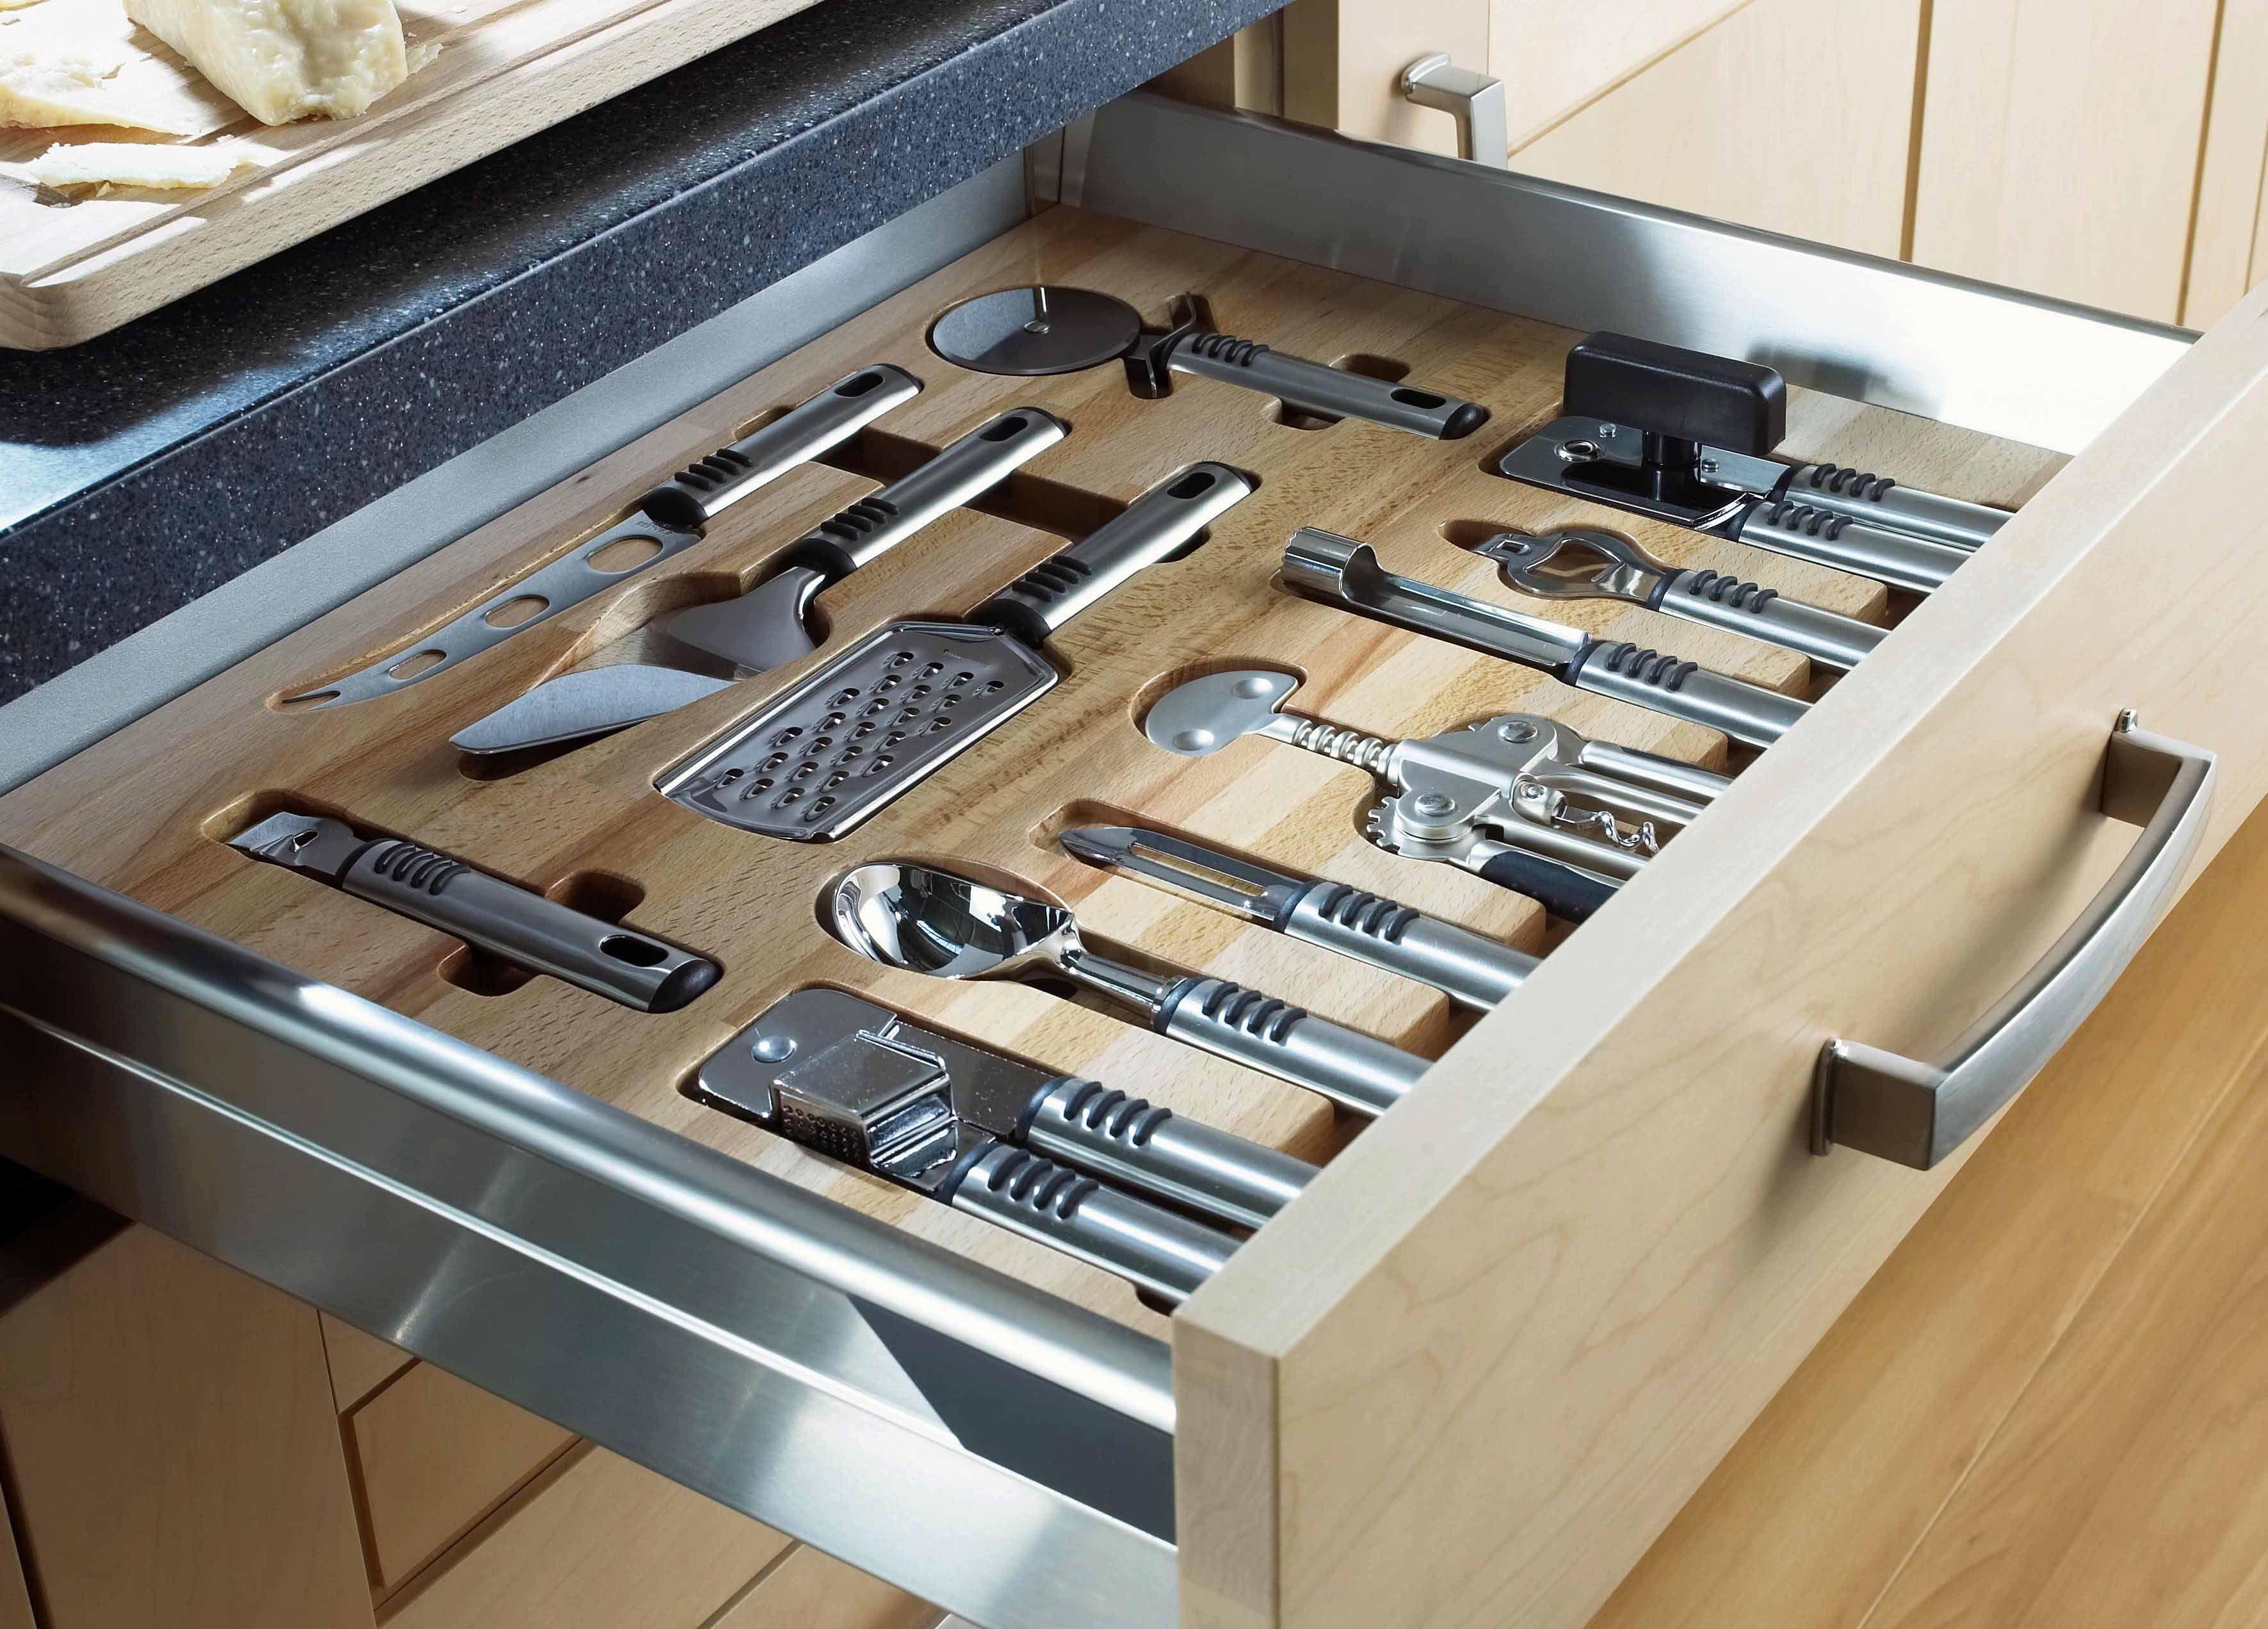 Genial Alfa Img   Showing U003e Kitchen Drawer Storage Solutions